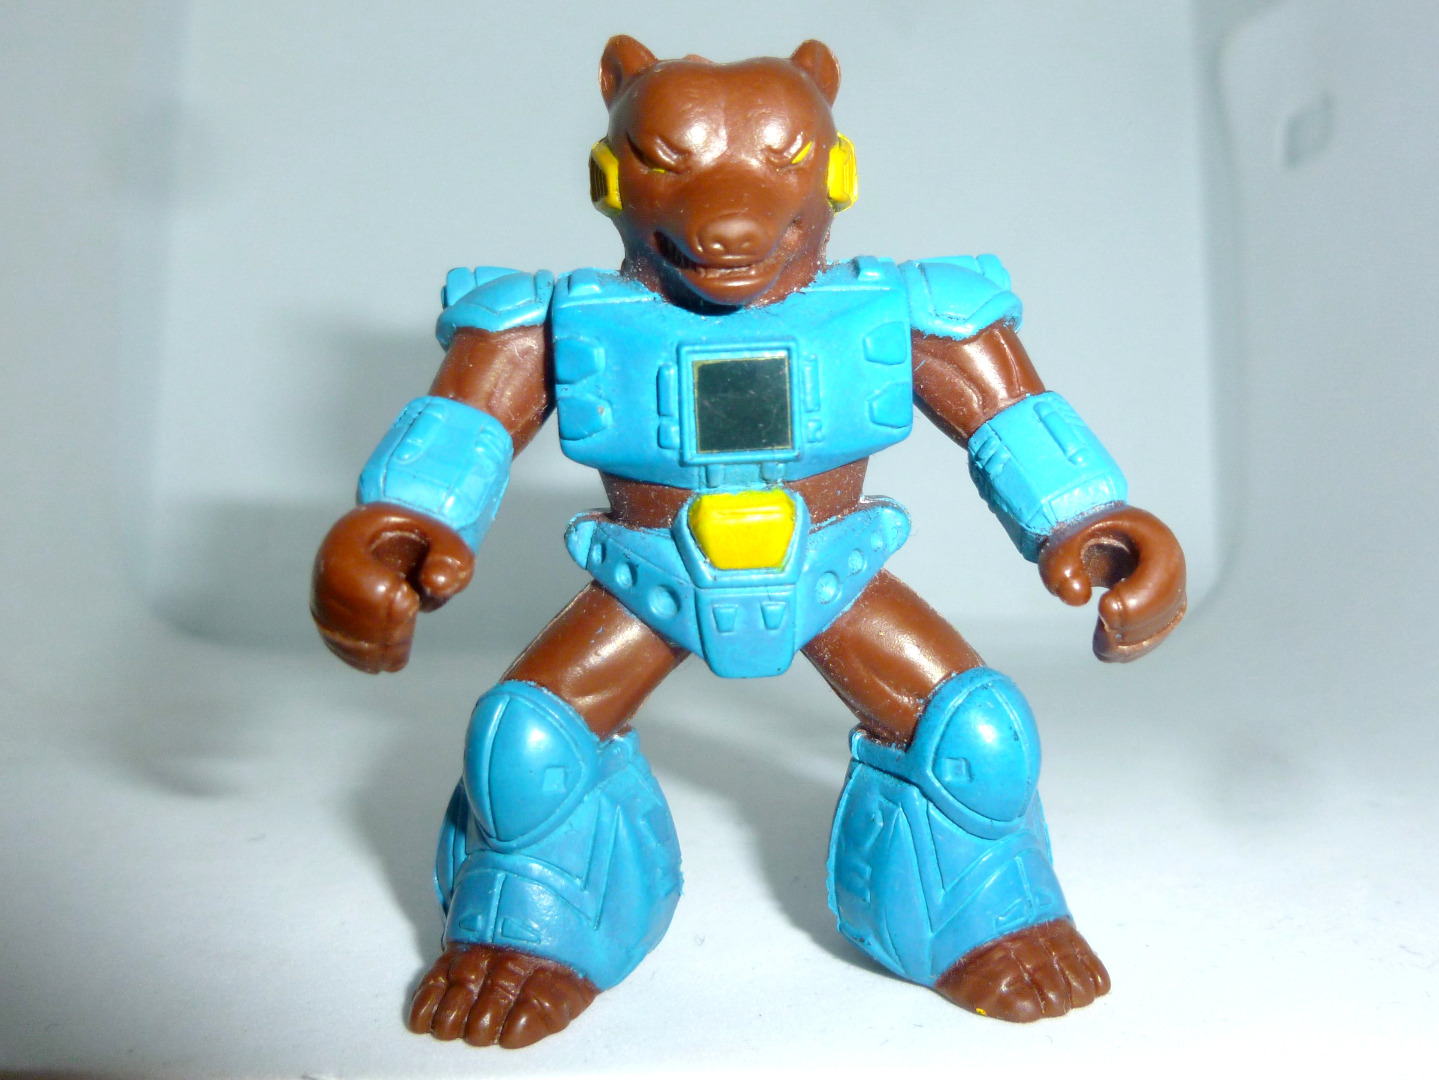 Battle Beasts Grizzly Bear Actionfigur Jetzt - 5